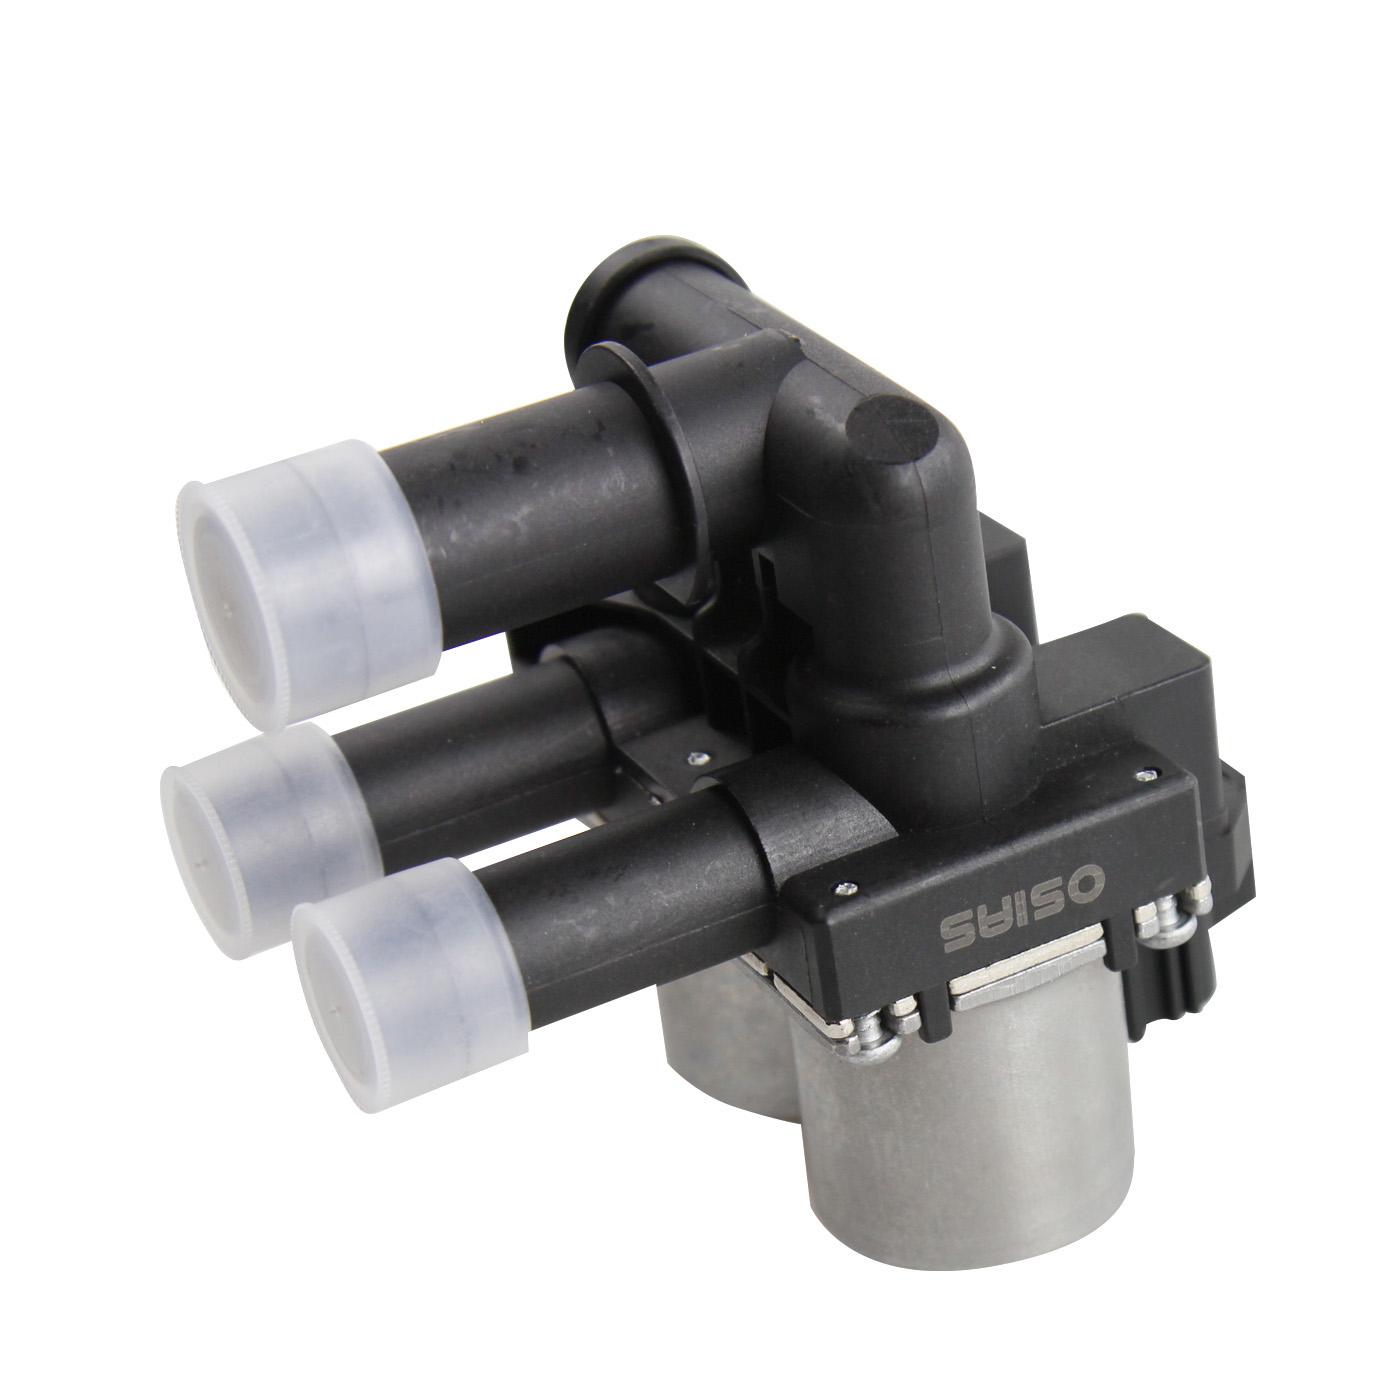 12Pcs//Set 25mm 1//4 Hex Shank Magnetic T20 Torx Screwdriver Bits W// Hole Tools